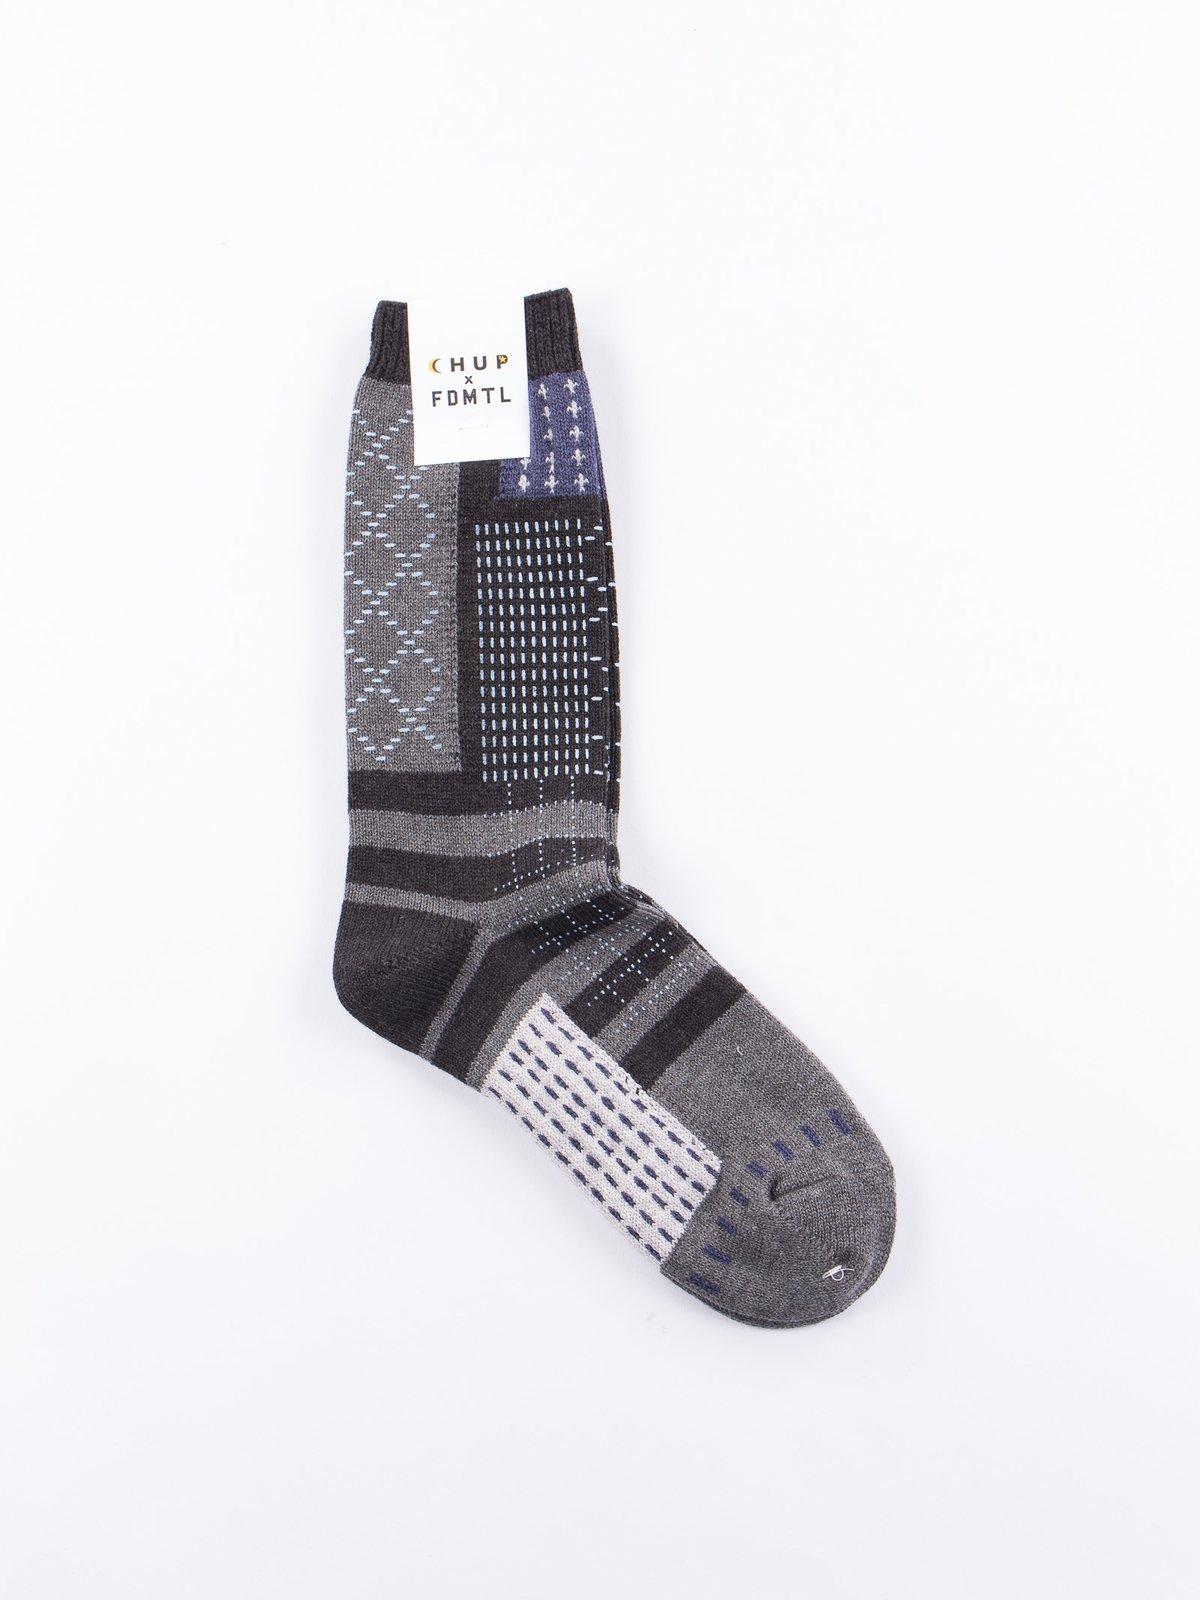 FDMTL Black Socks - Image 1